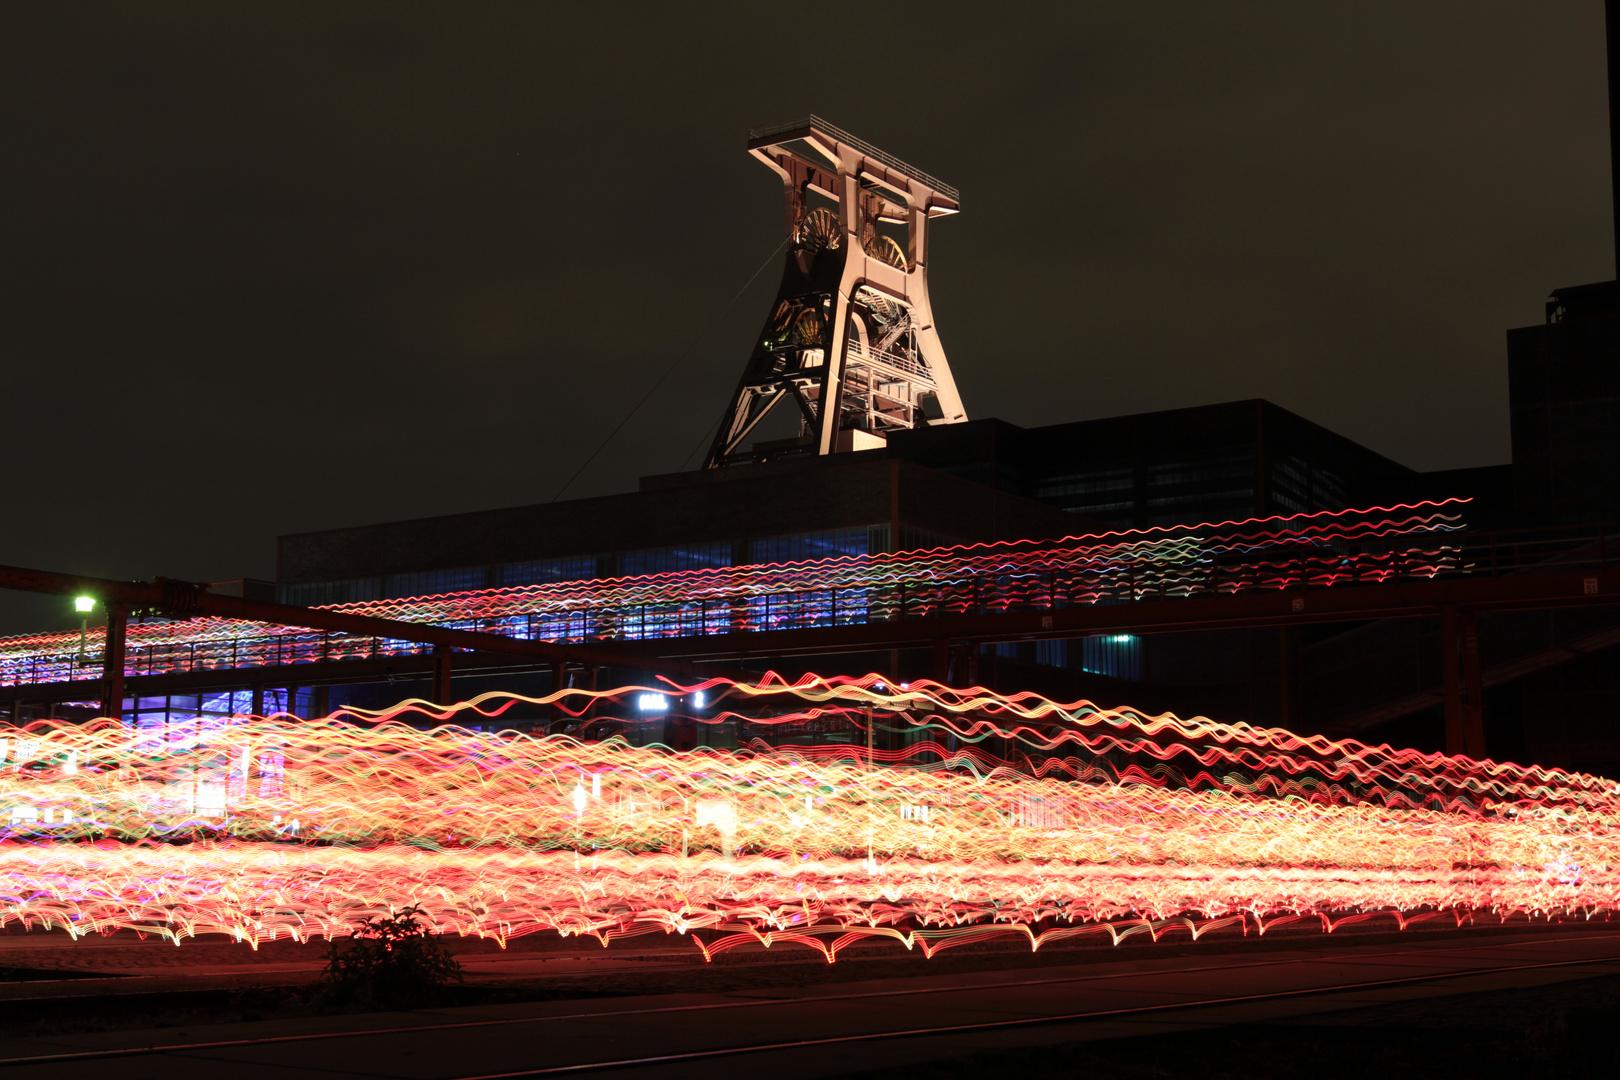 Zeche Zollverein - speed of light/light of speed event